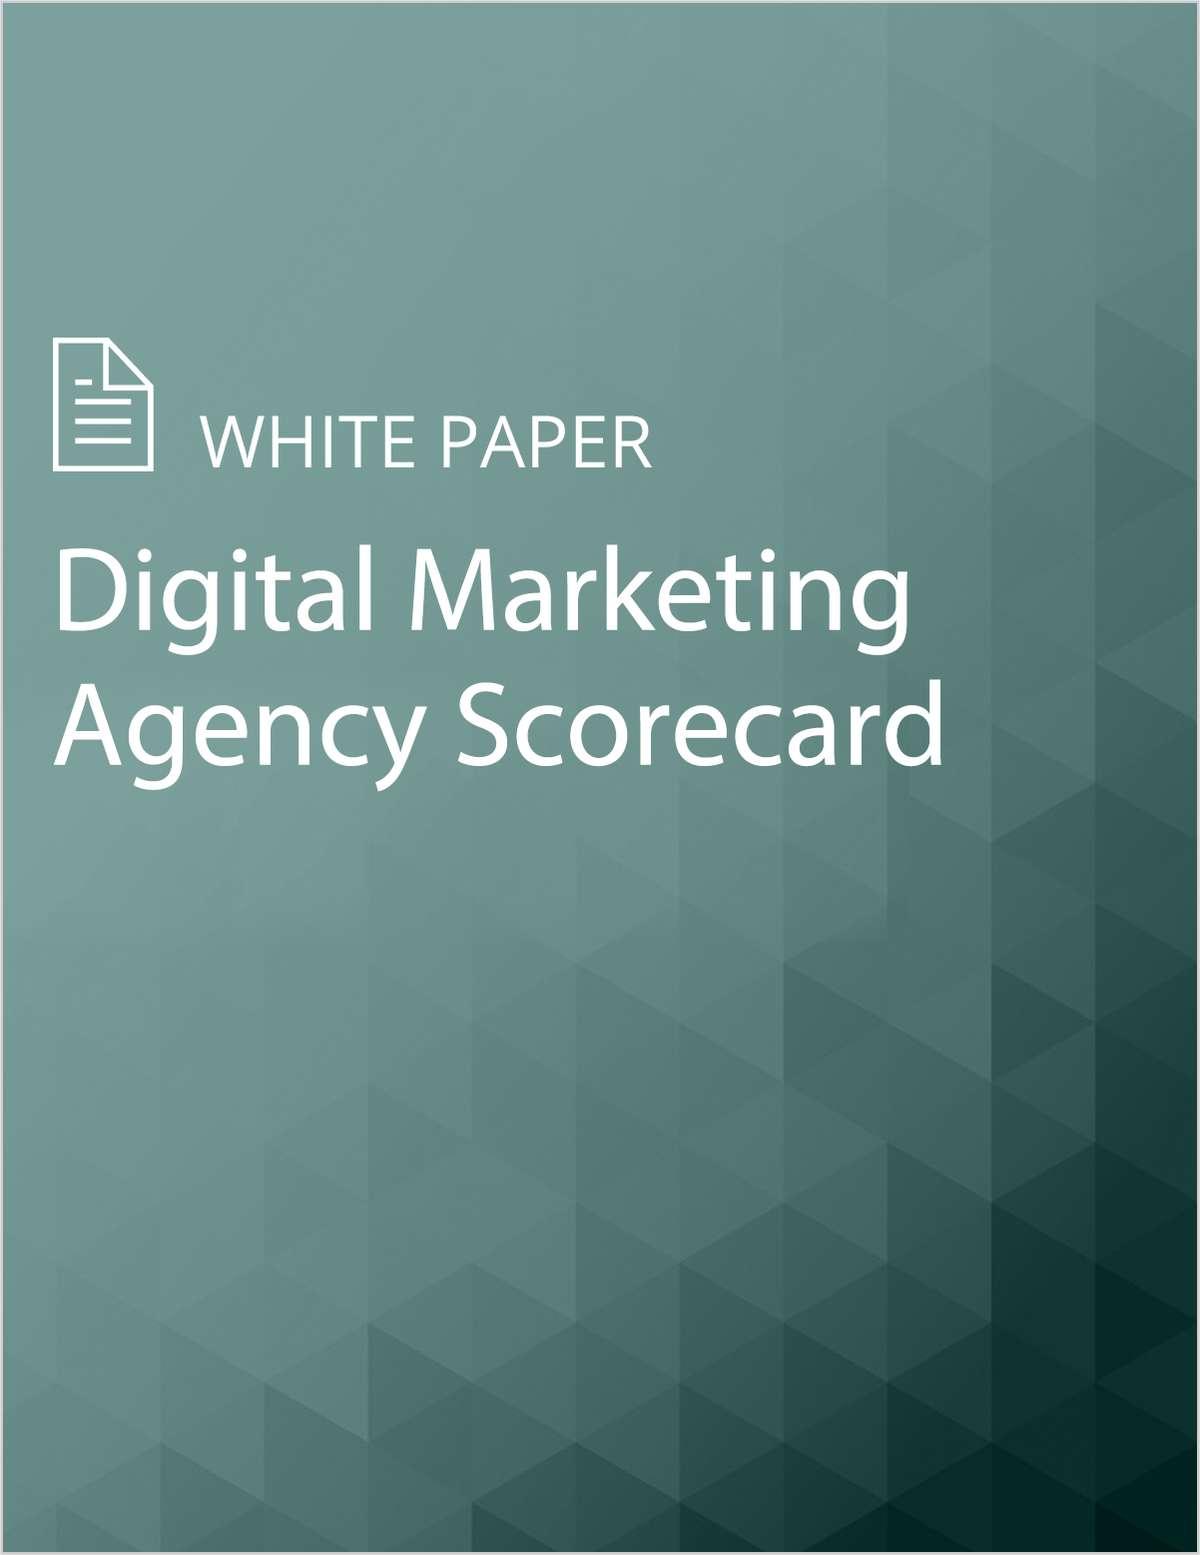 Digital Marketing Agency Scorecard